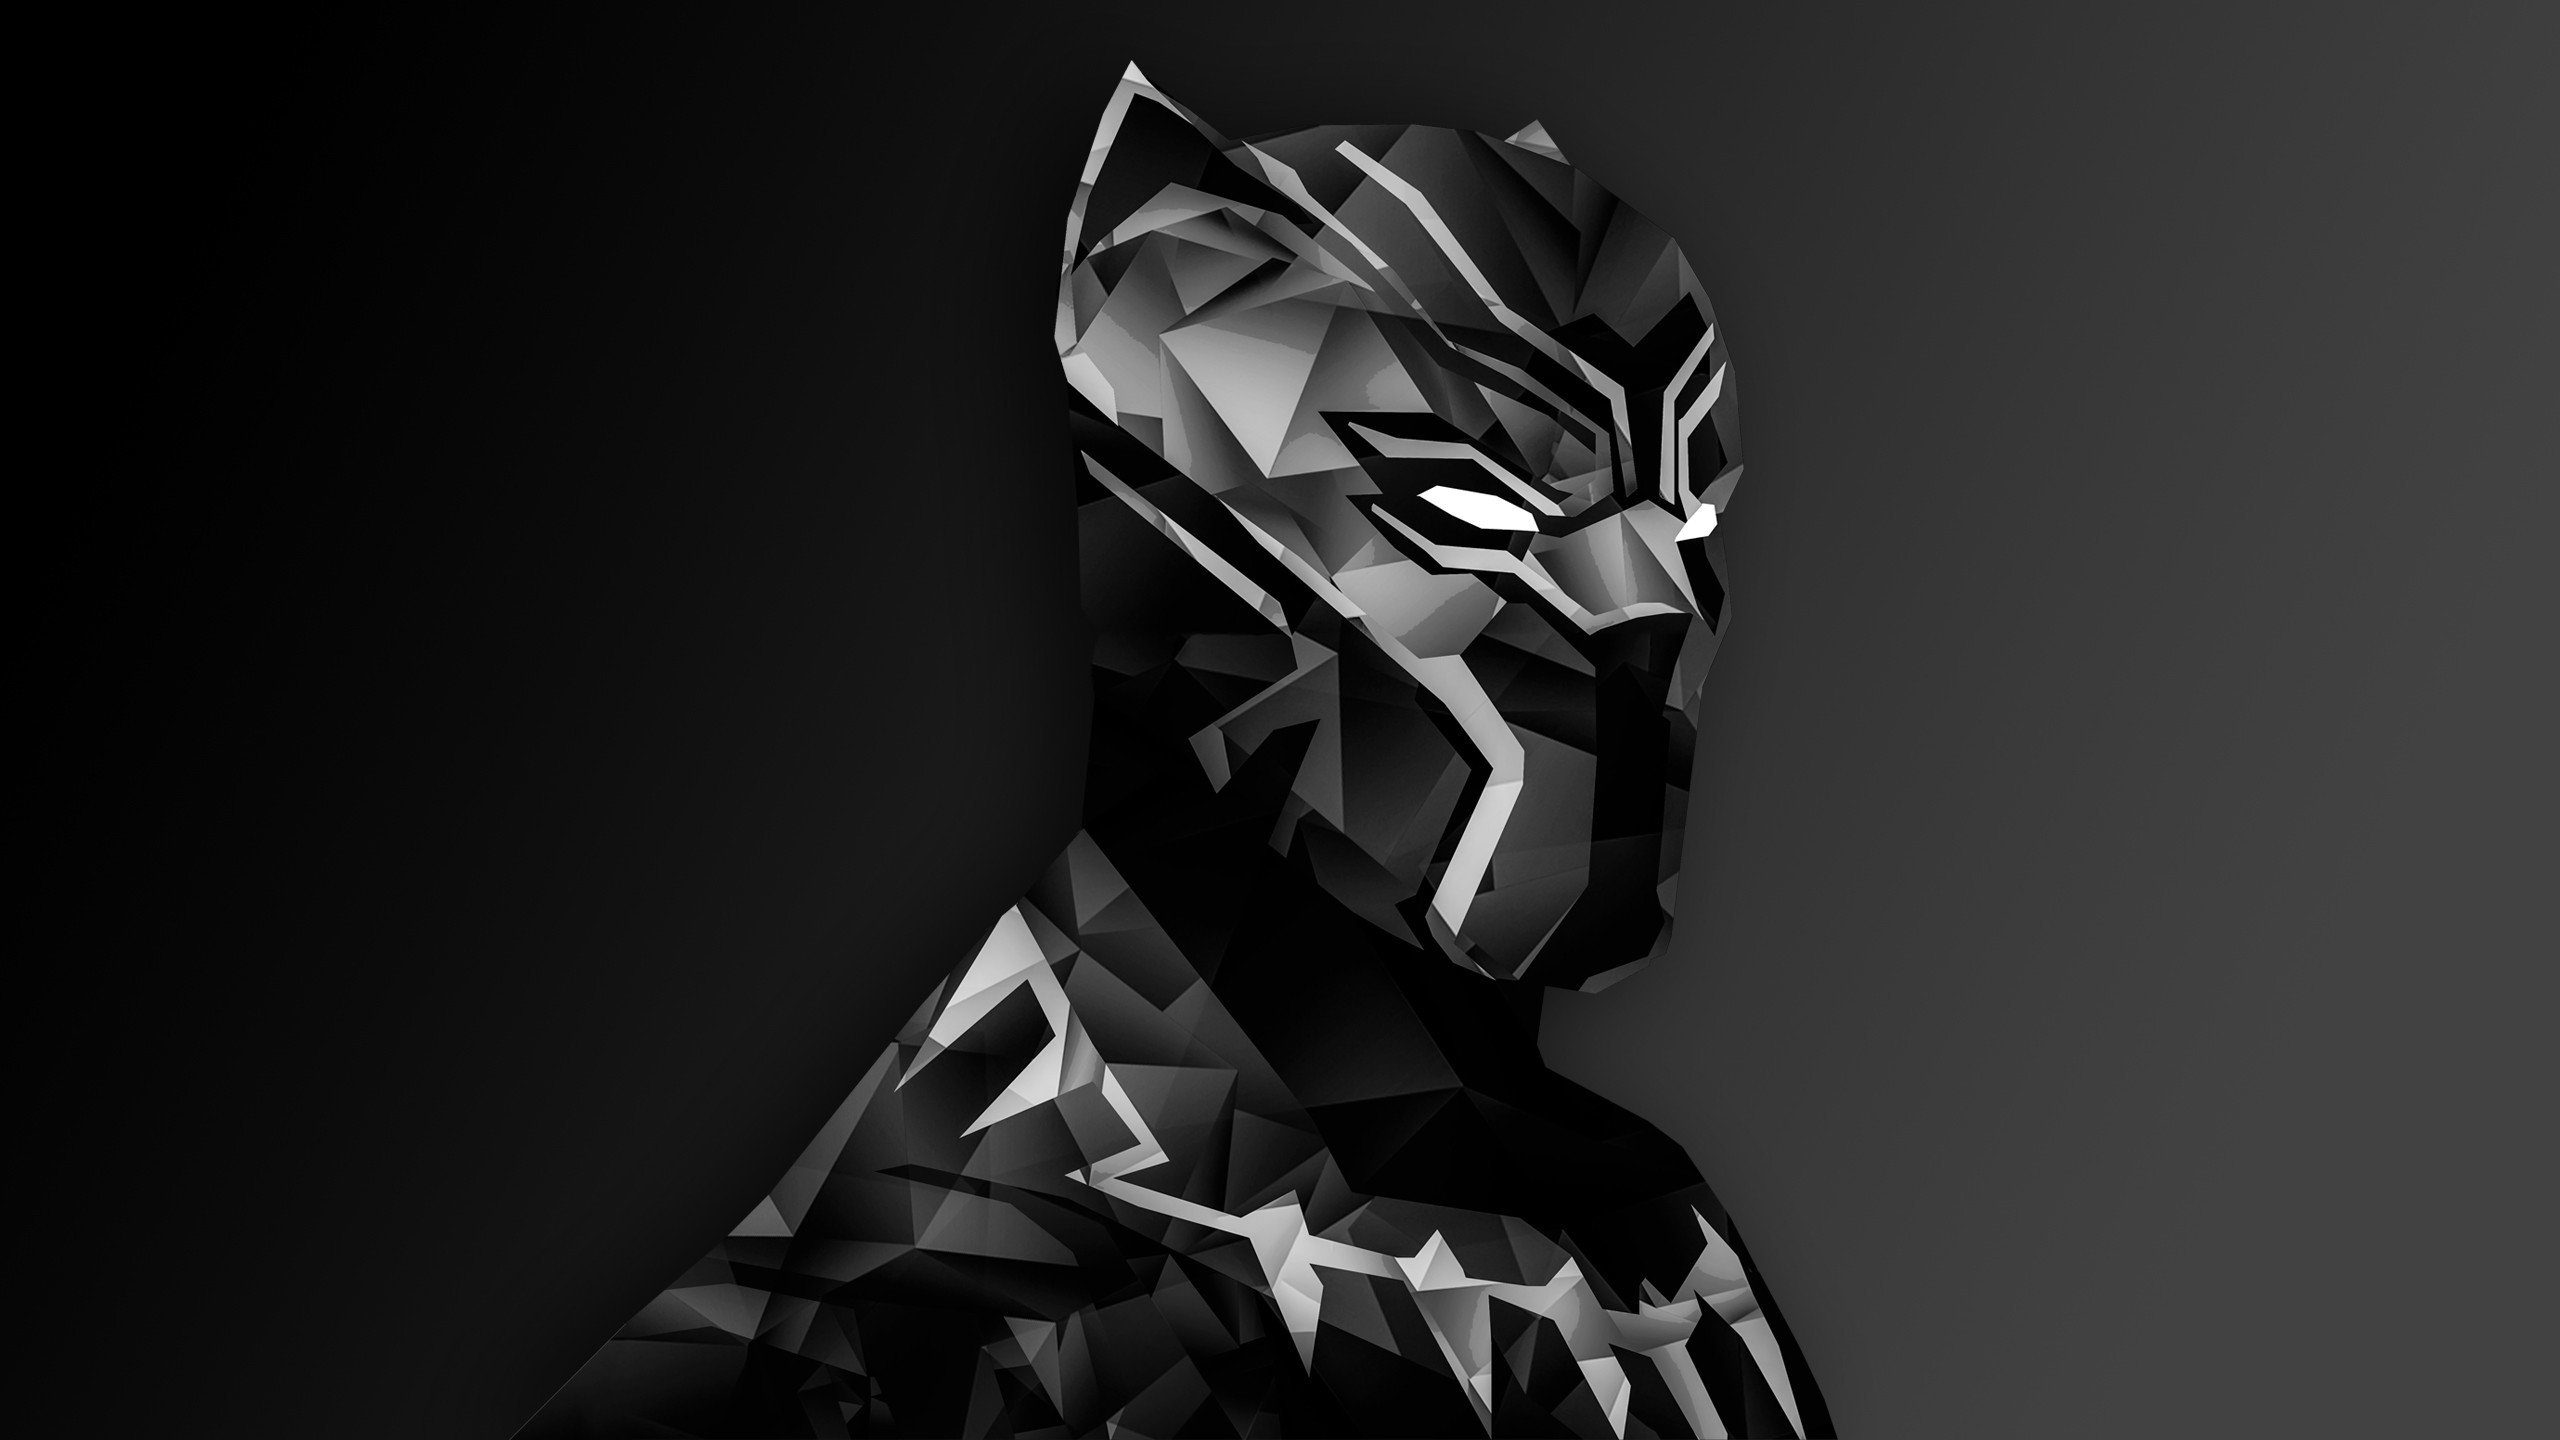 Black Panther Digital Art Wallpaper | Superheroes HD Wallpapers